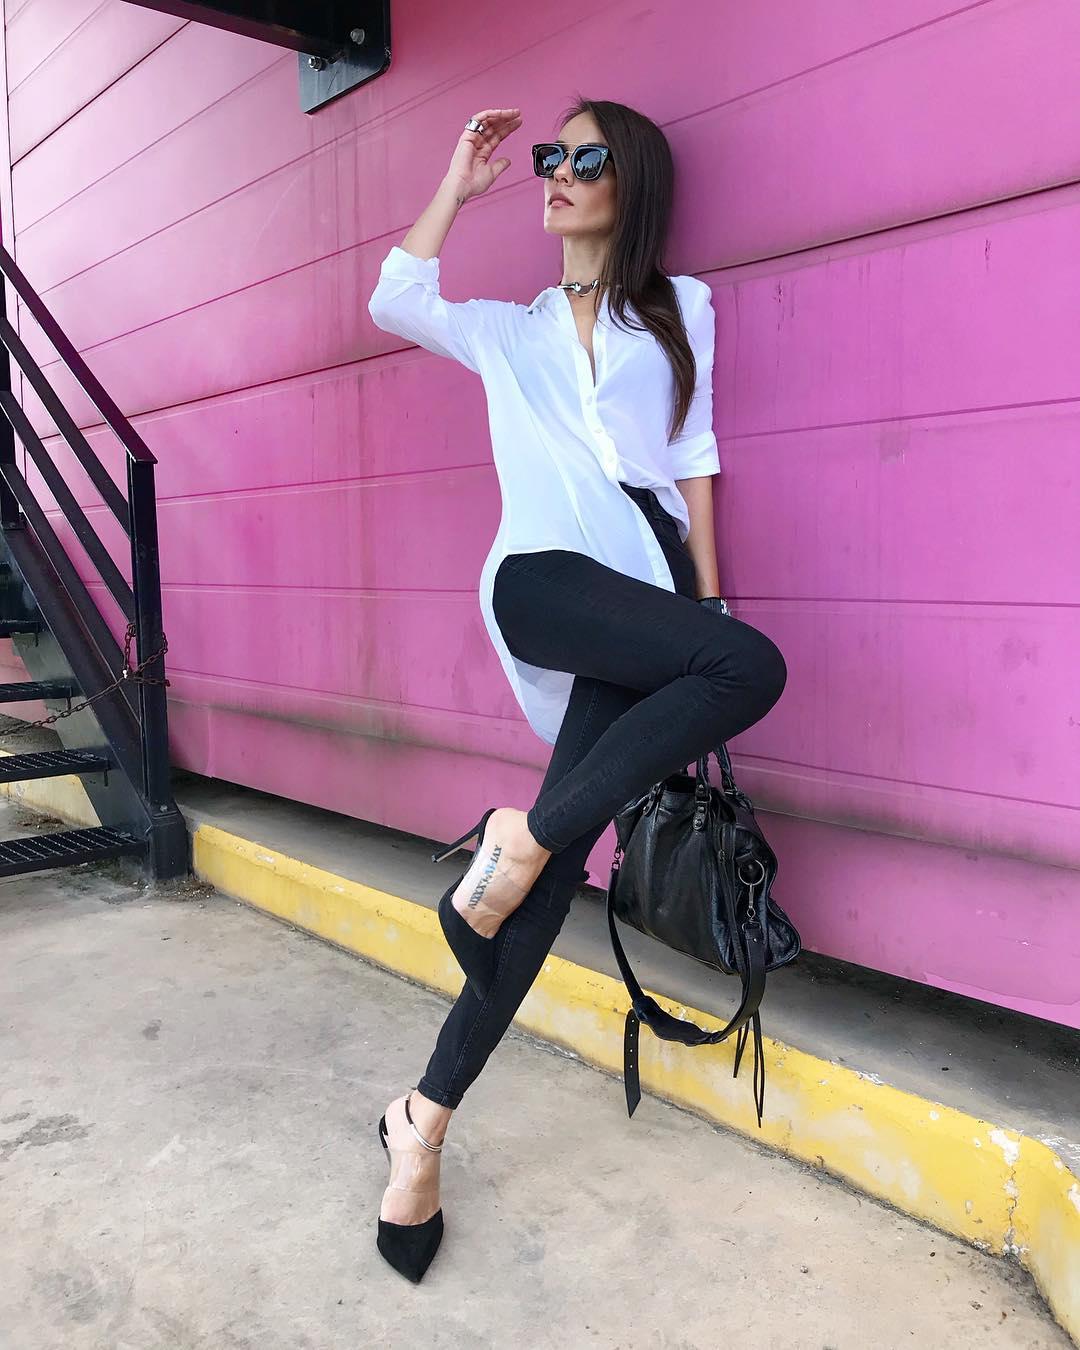 f4b1671967b3 Είναι ένα μοναδικό κορίτσι που σίγουρα θα το χαρακτήριζες fashion icon για  τις προσεγμένες στιλιστικές της επιλογές και τις φωτογραφίες της που  πραγματικά ...